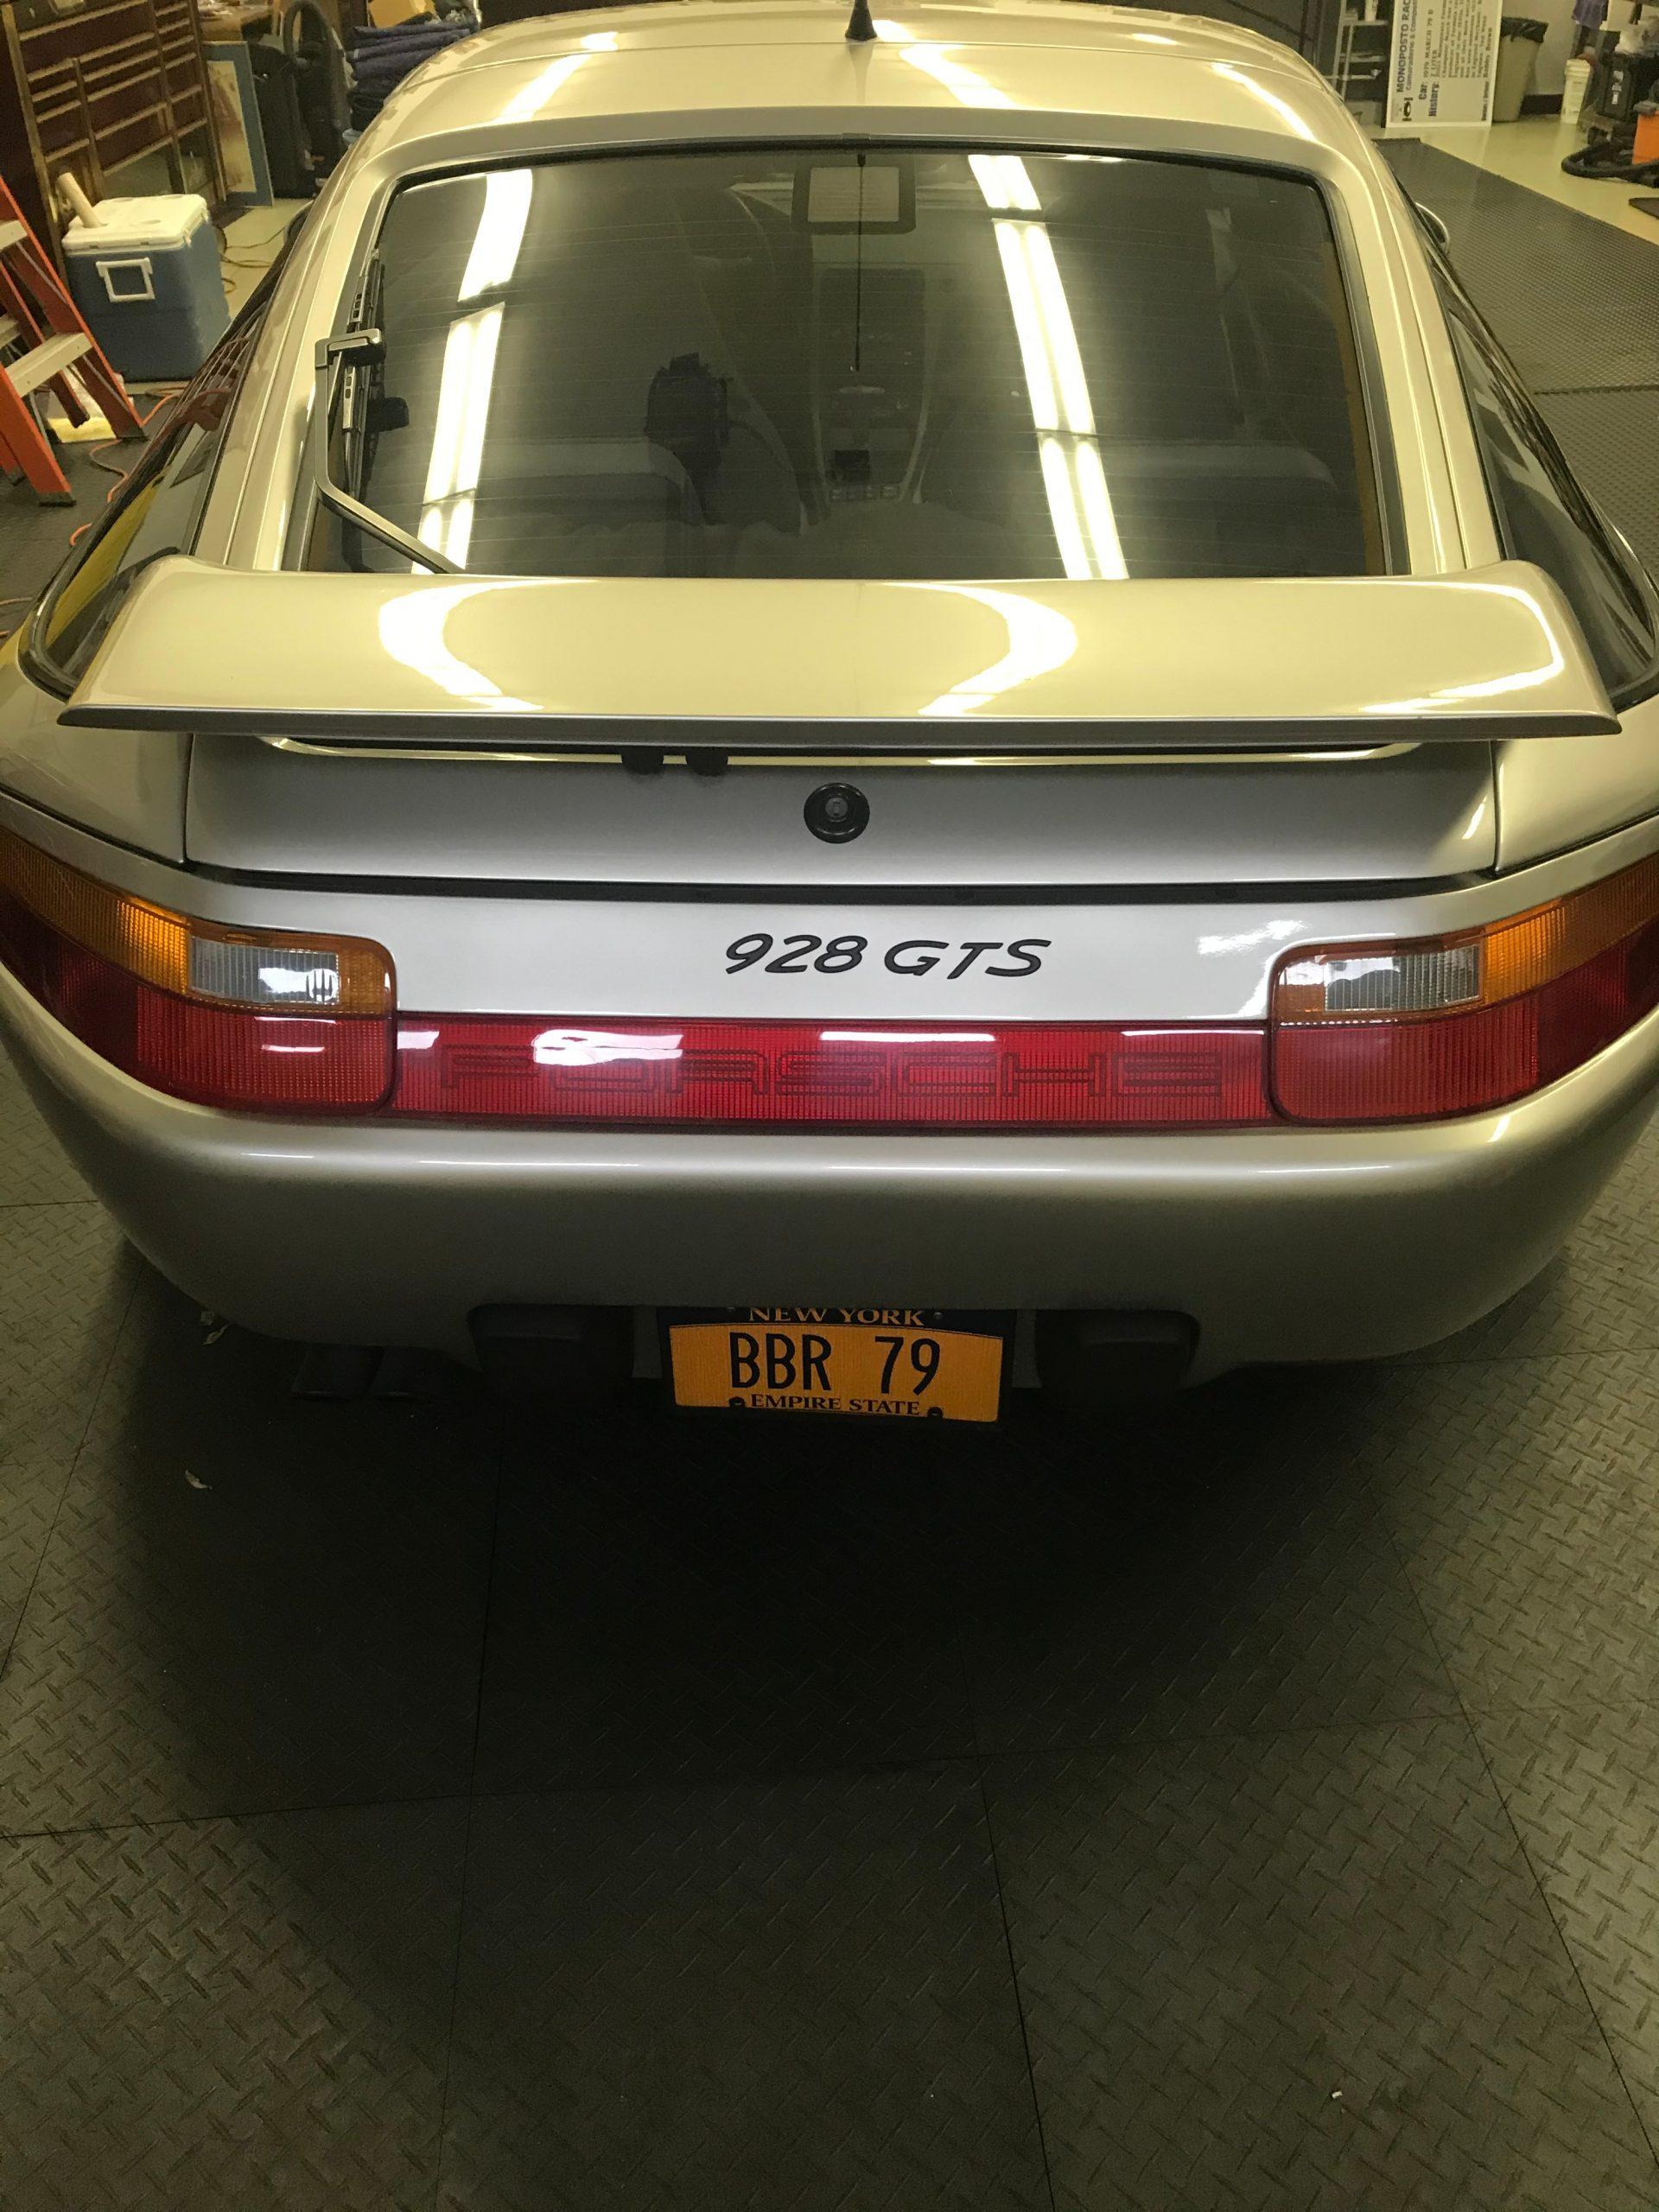 93 P928GTS - 2